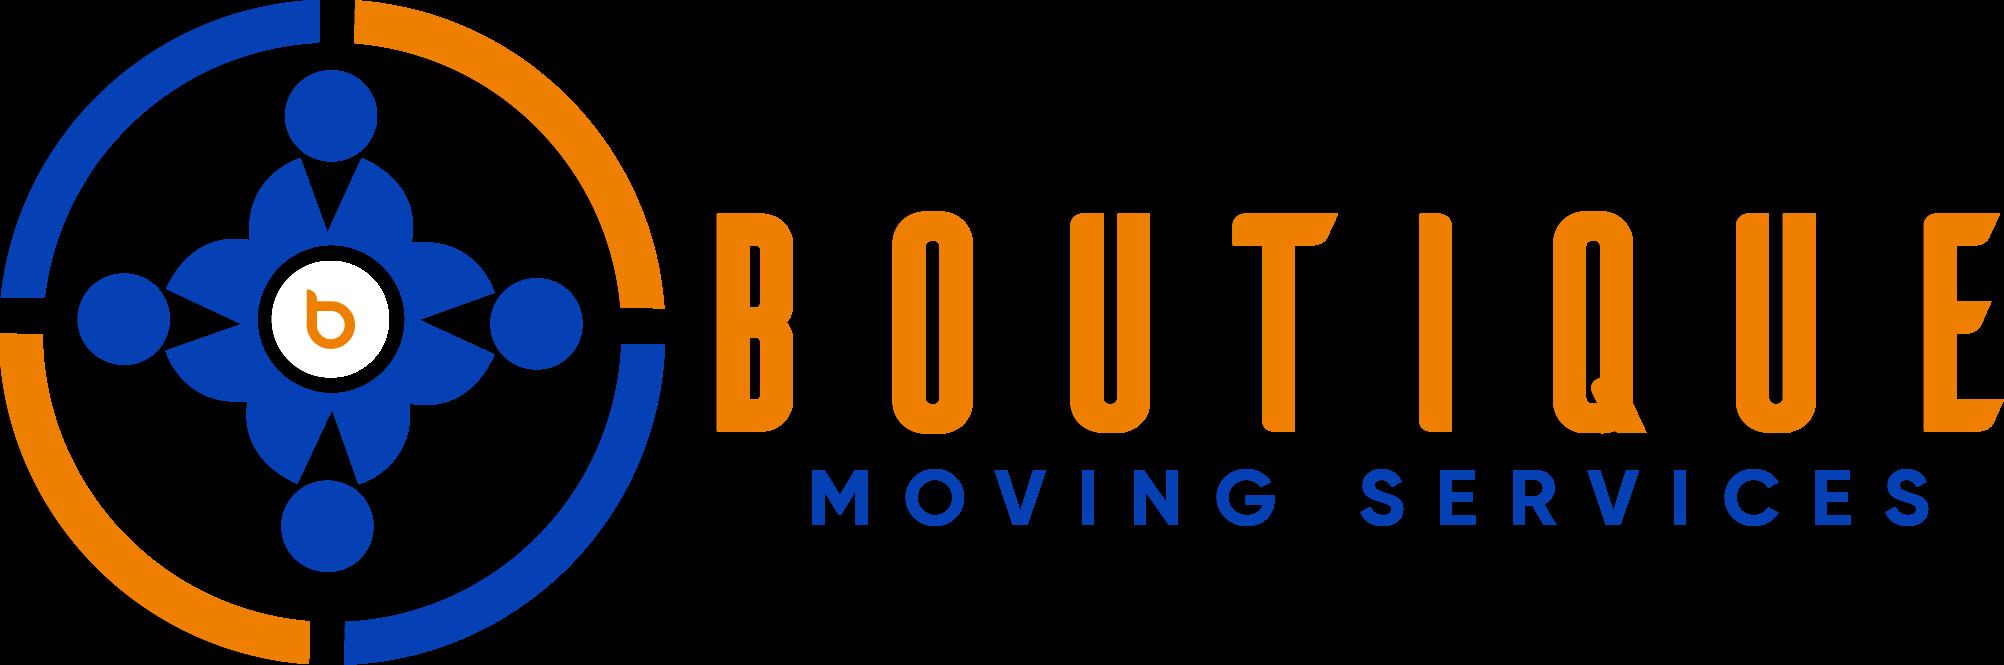 Boutique Moving Services Logo